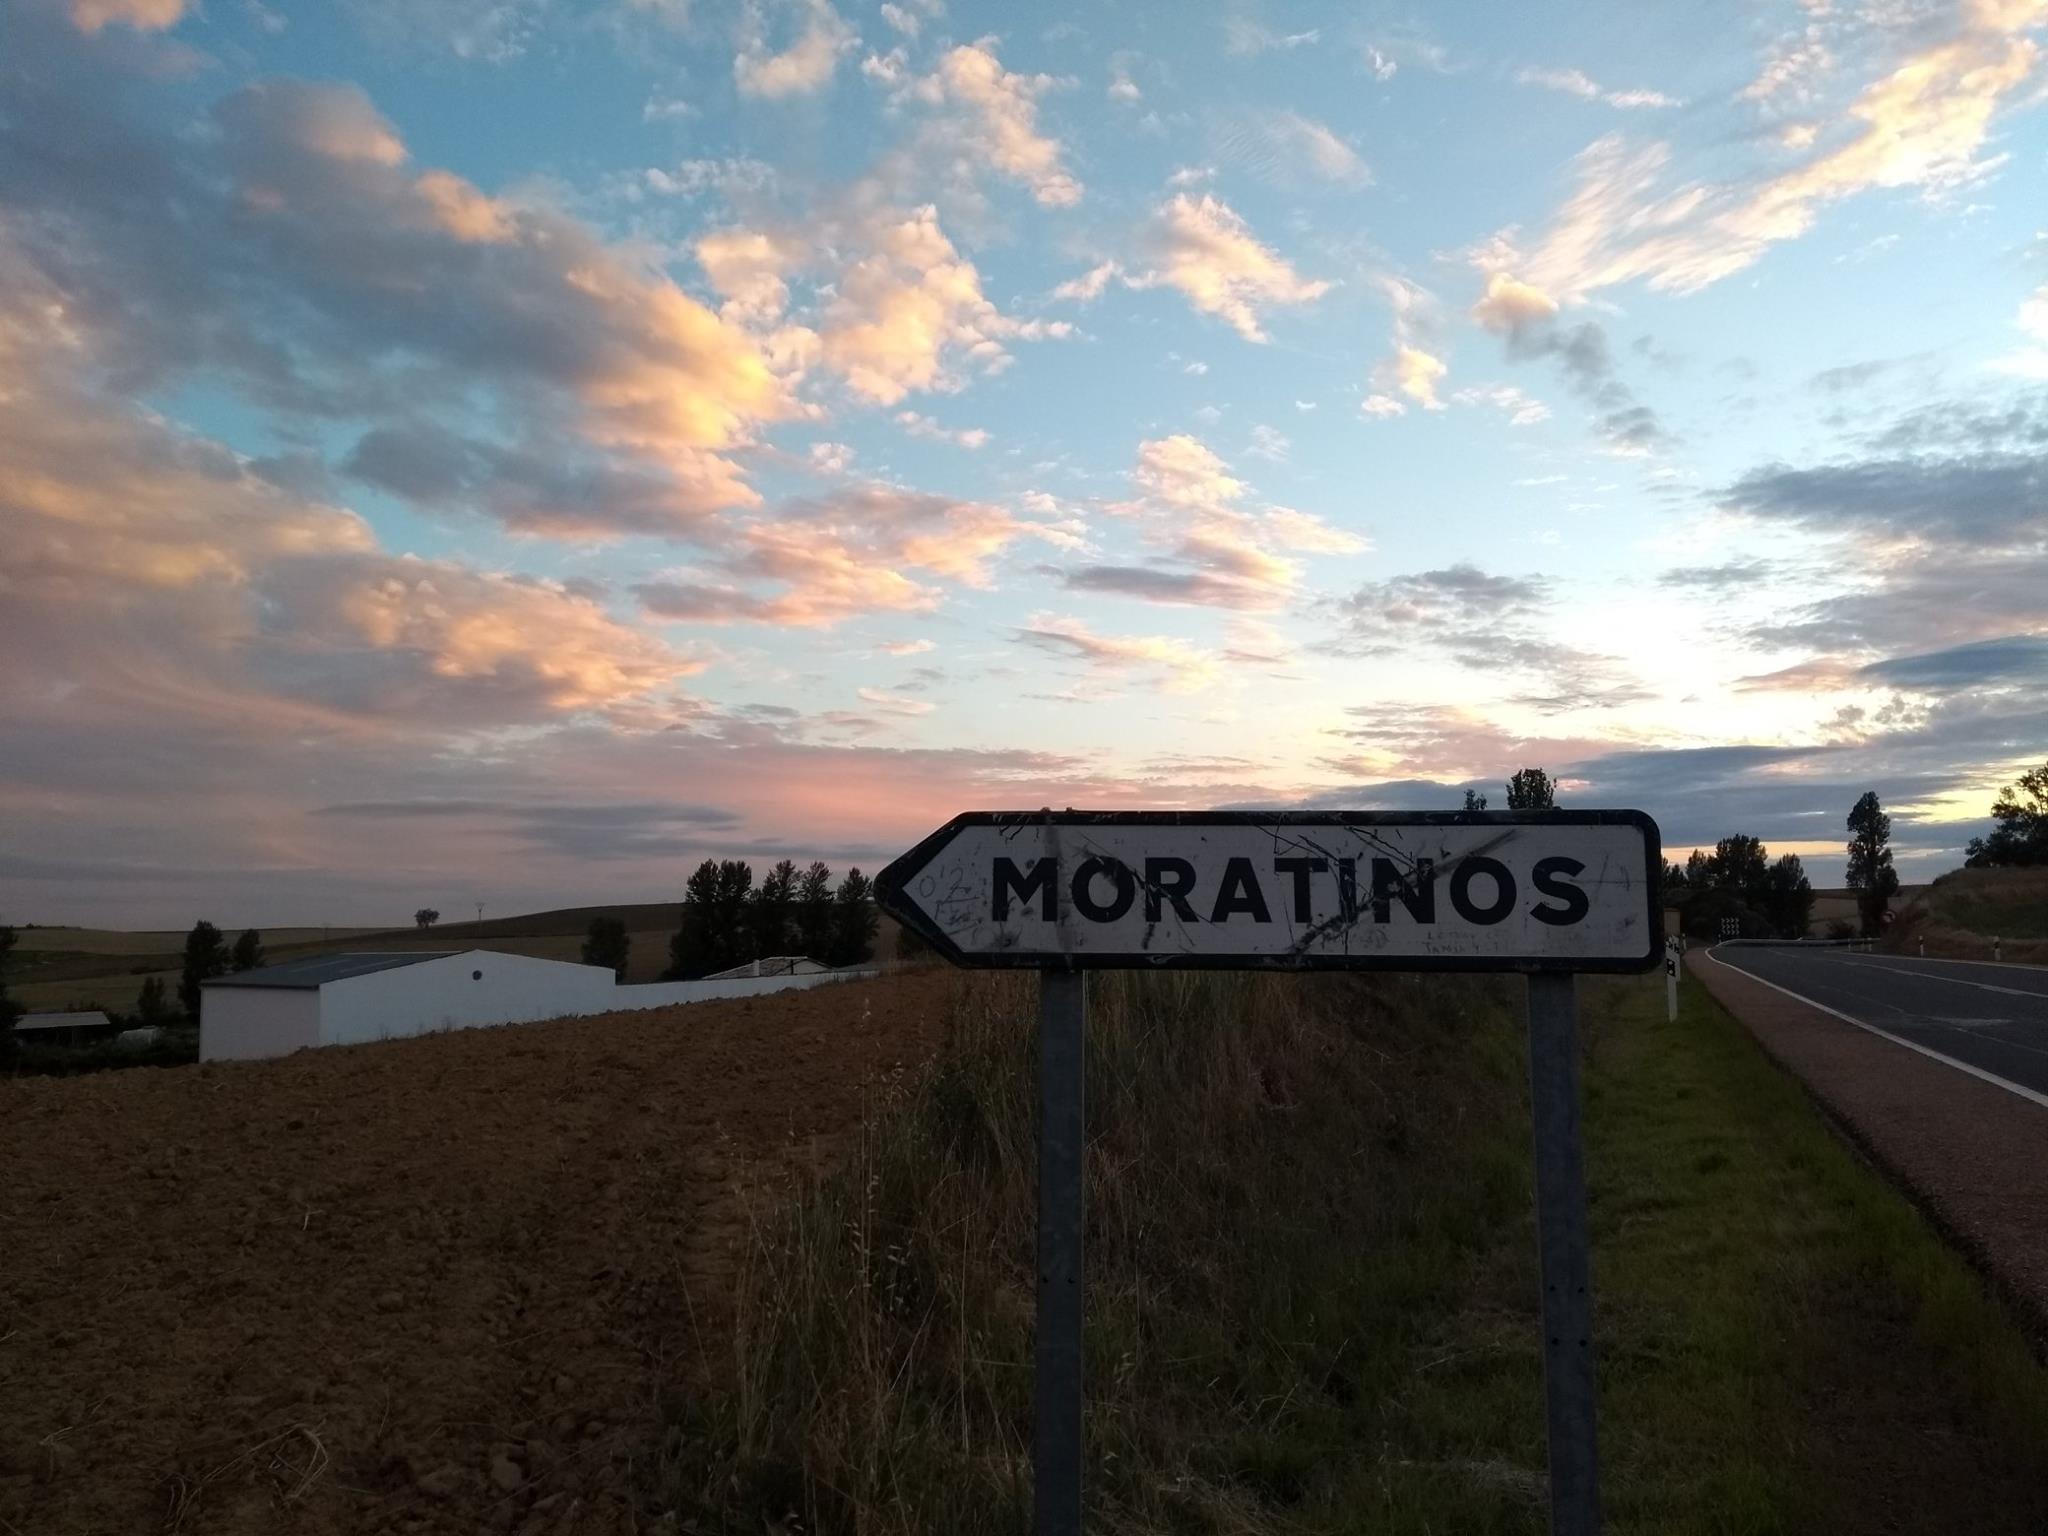 Meet Bruno, Moratinos albergue owner